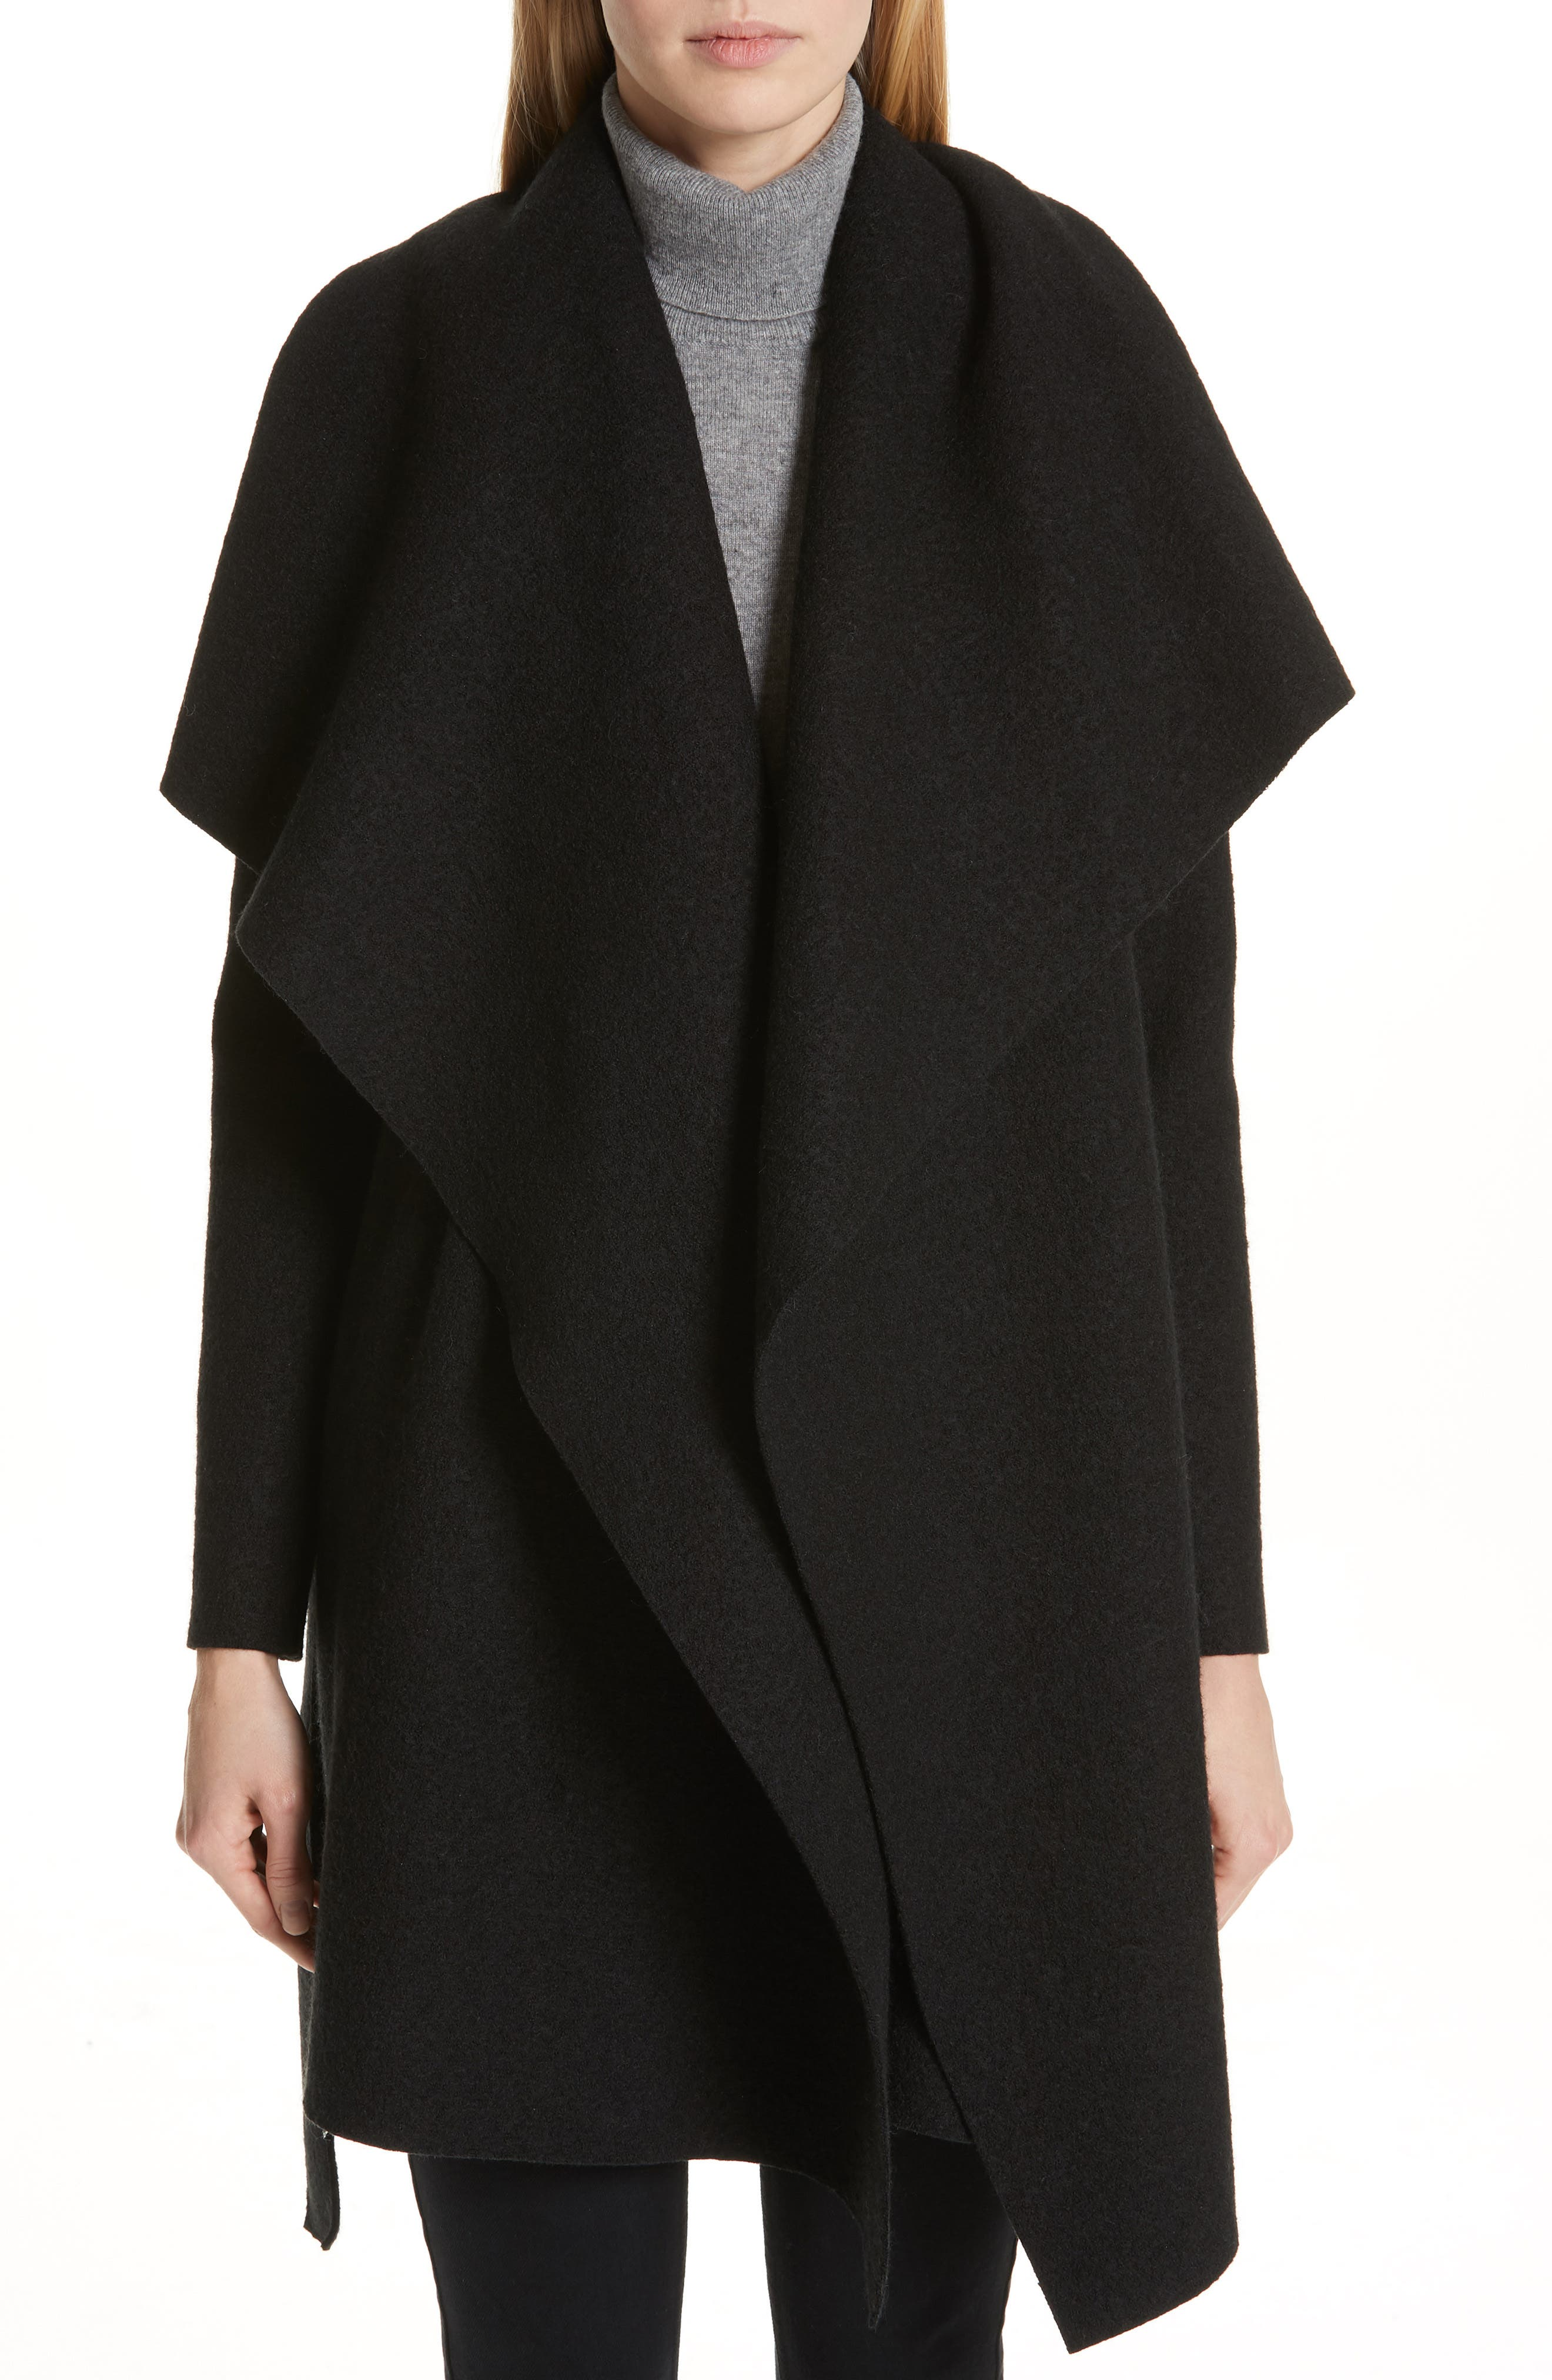 HARRIS WHARF LONDON Belted Wool Coat, Main, color, BLACK